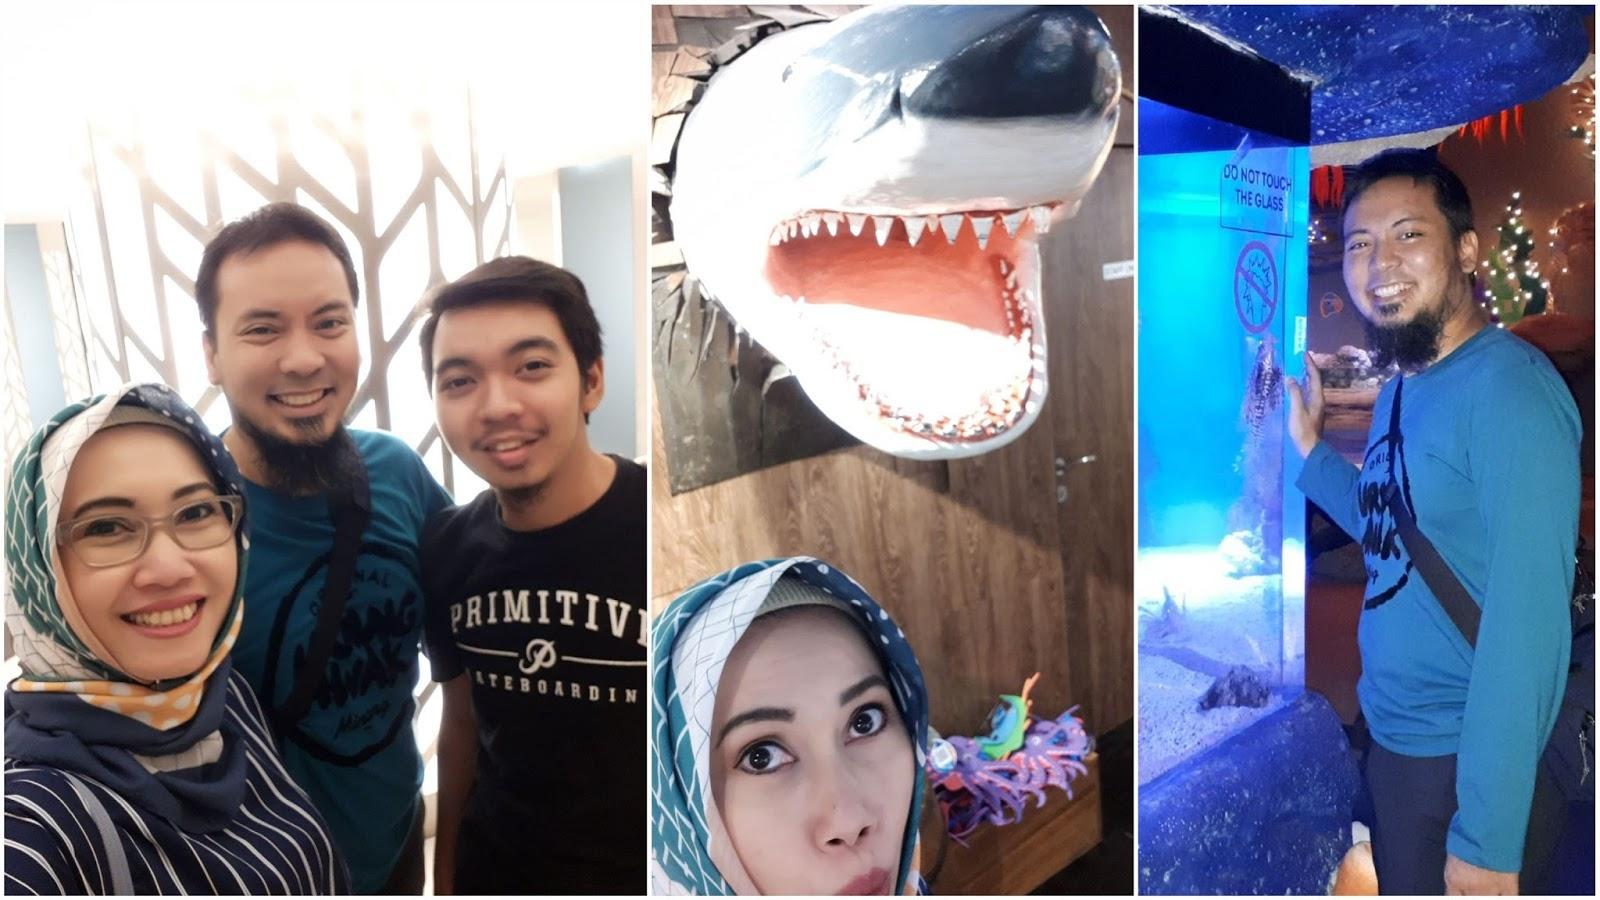 Berkunjung Ke Jakarta Aquarium The Traveling Cow Et Ticket Reguler Weekday Muka Yang Abis Piknik